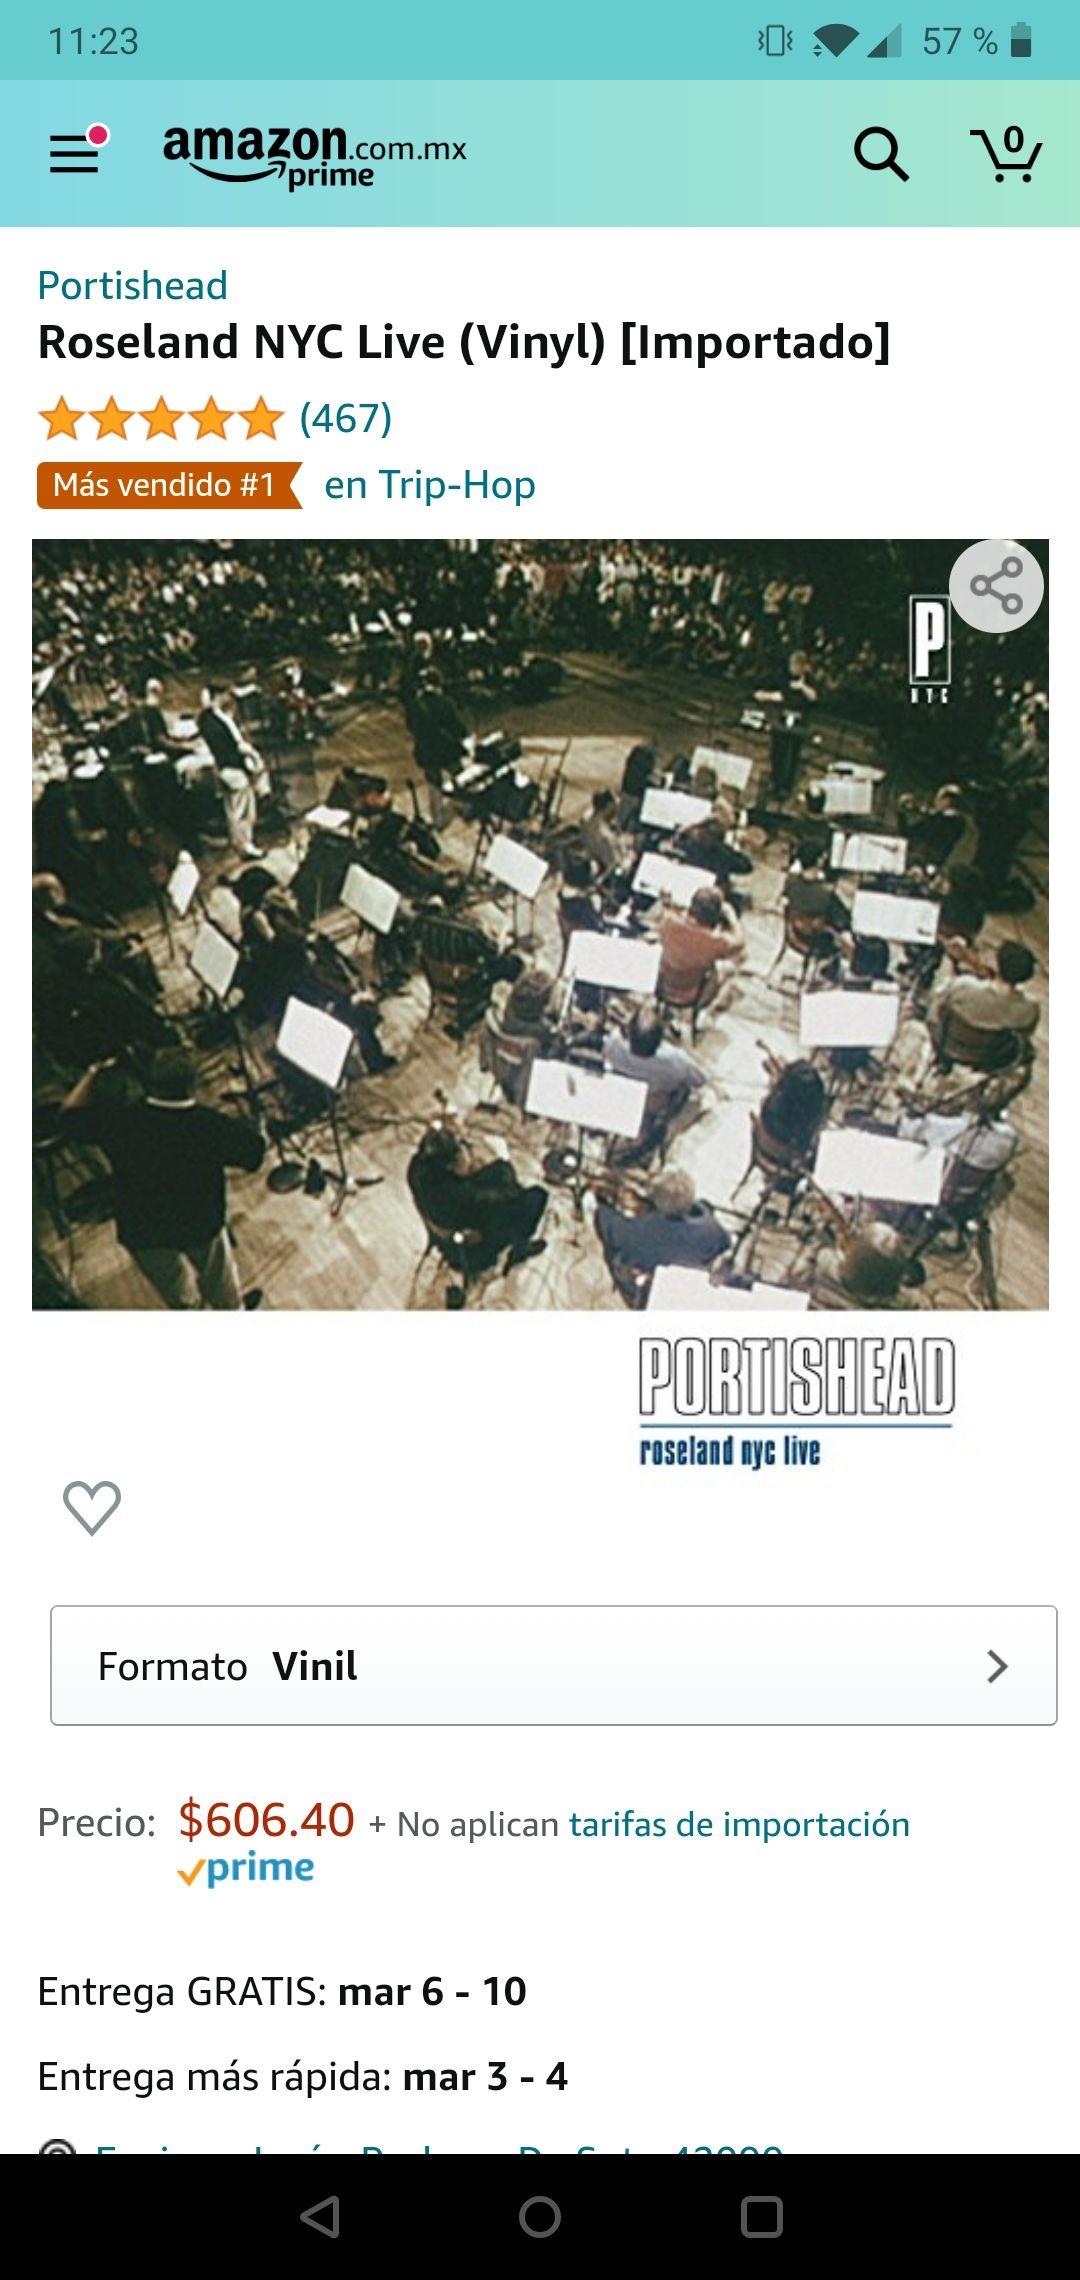 Amazon: Portishead live in roseland vinyl